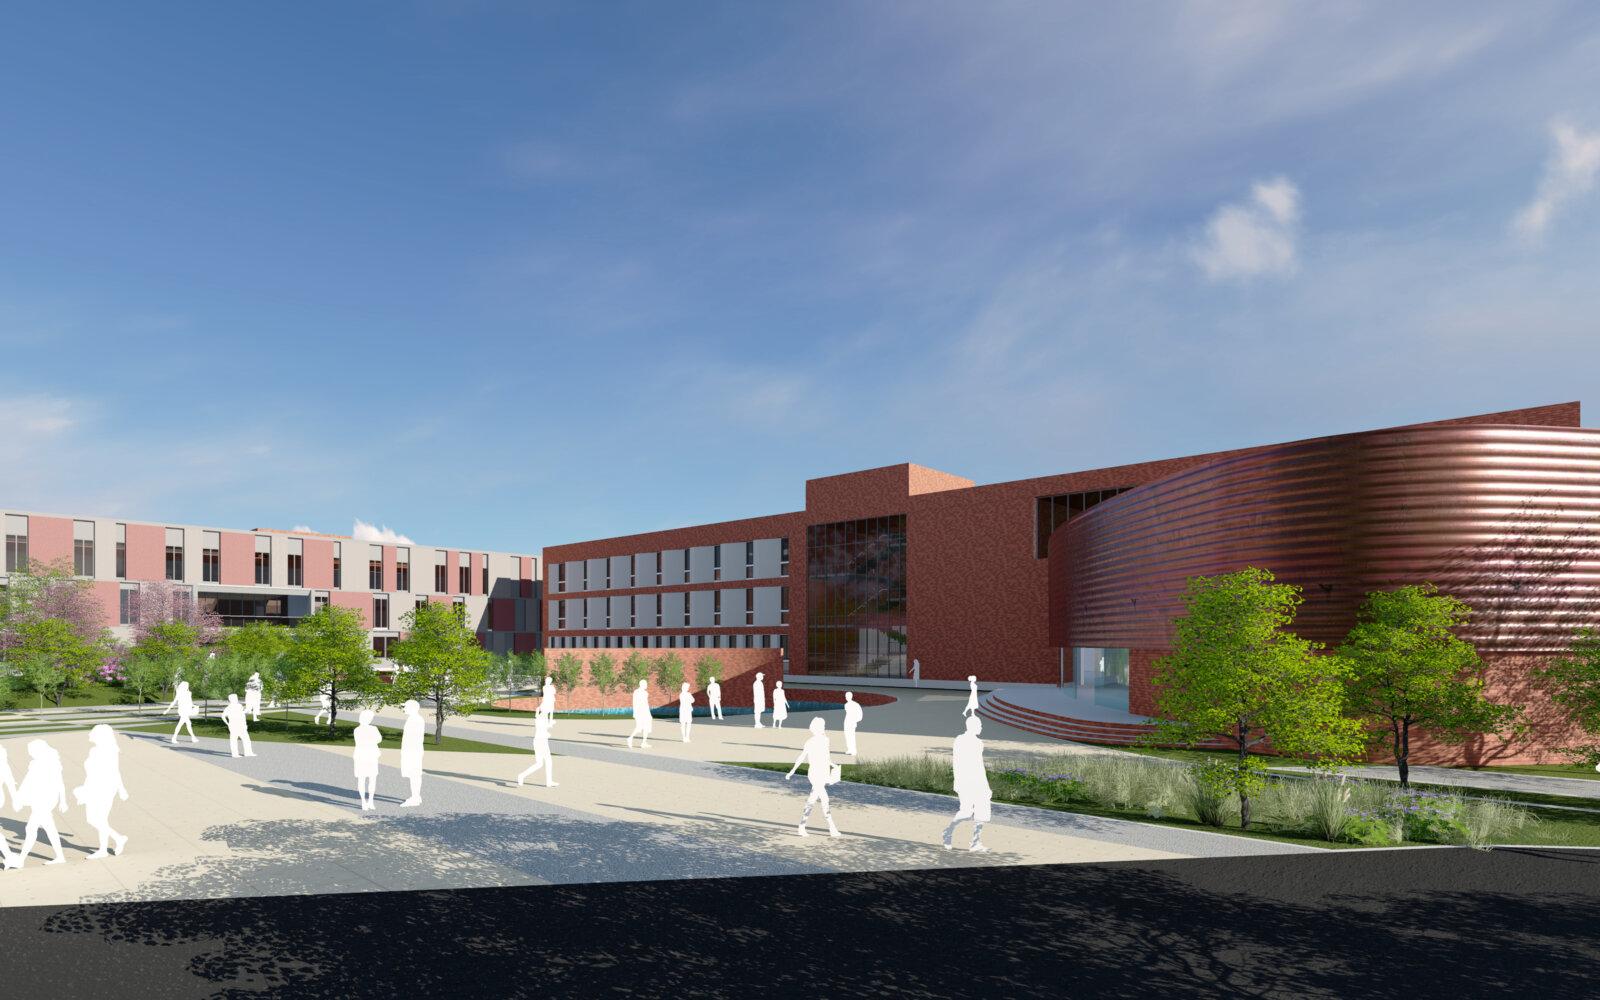 Regional Institute of Allied Health Sciences India external CGI